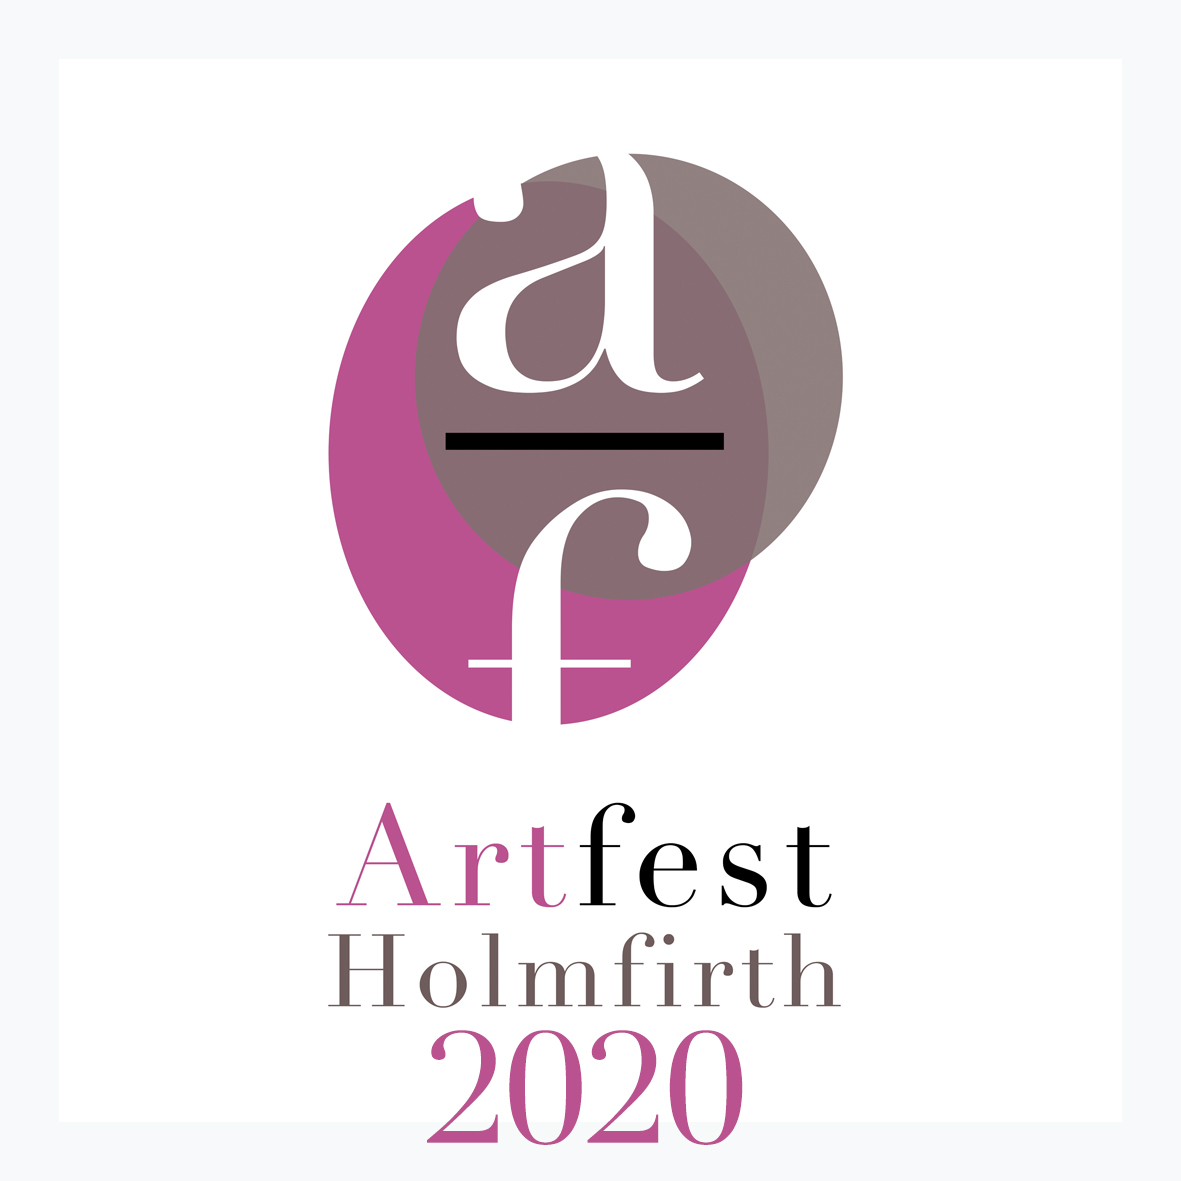 Artfest Holmfirth 2020